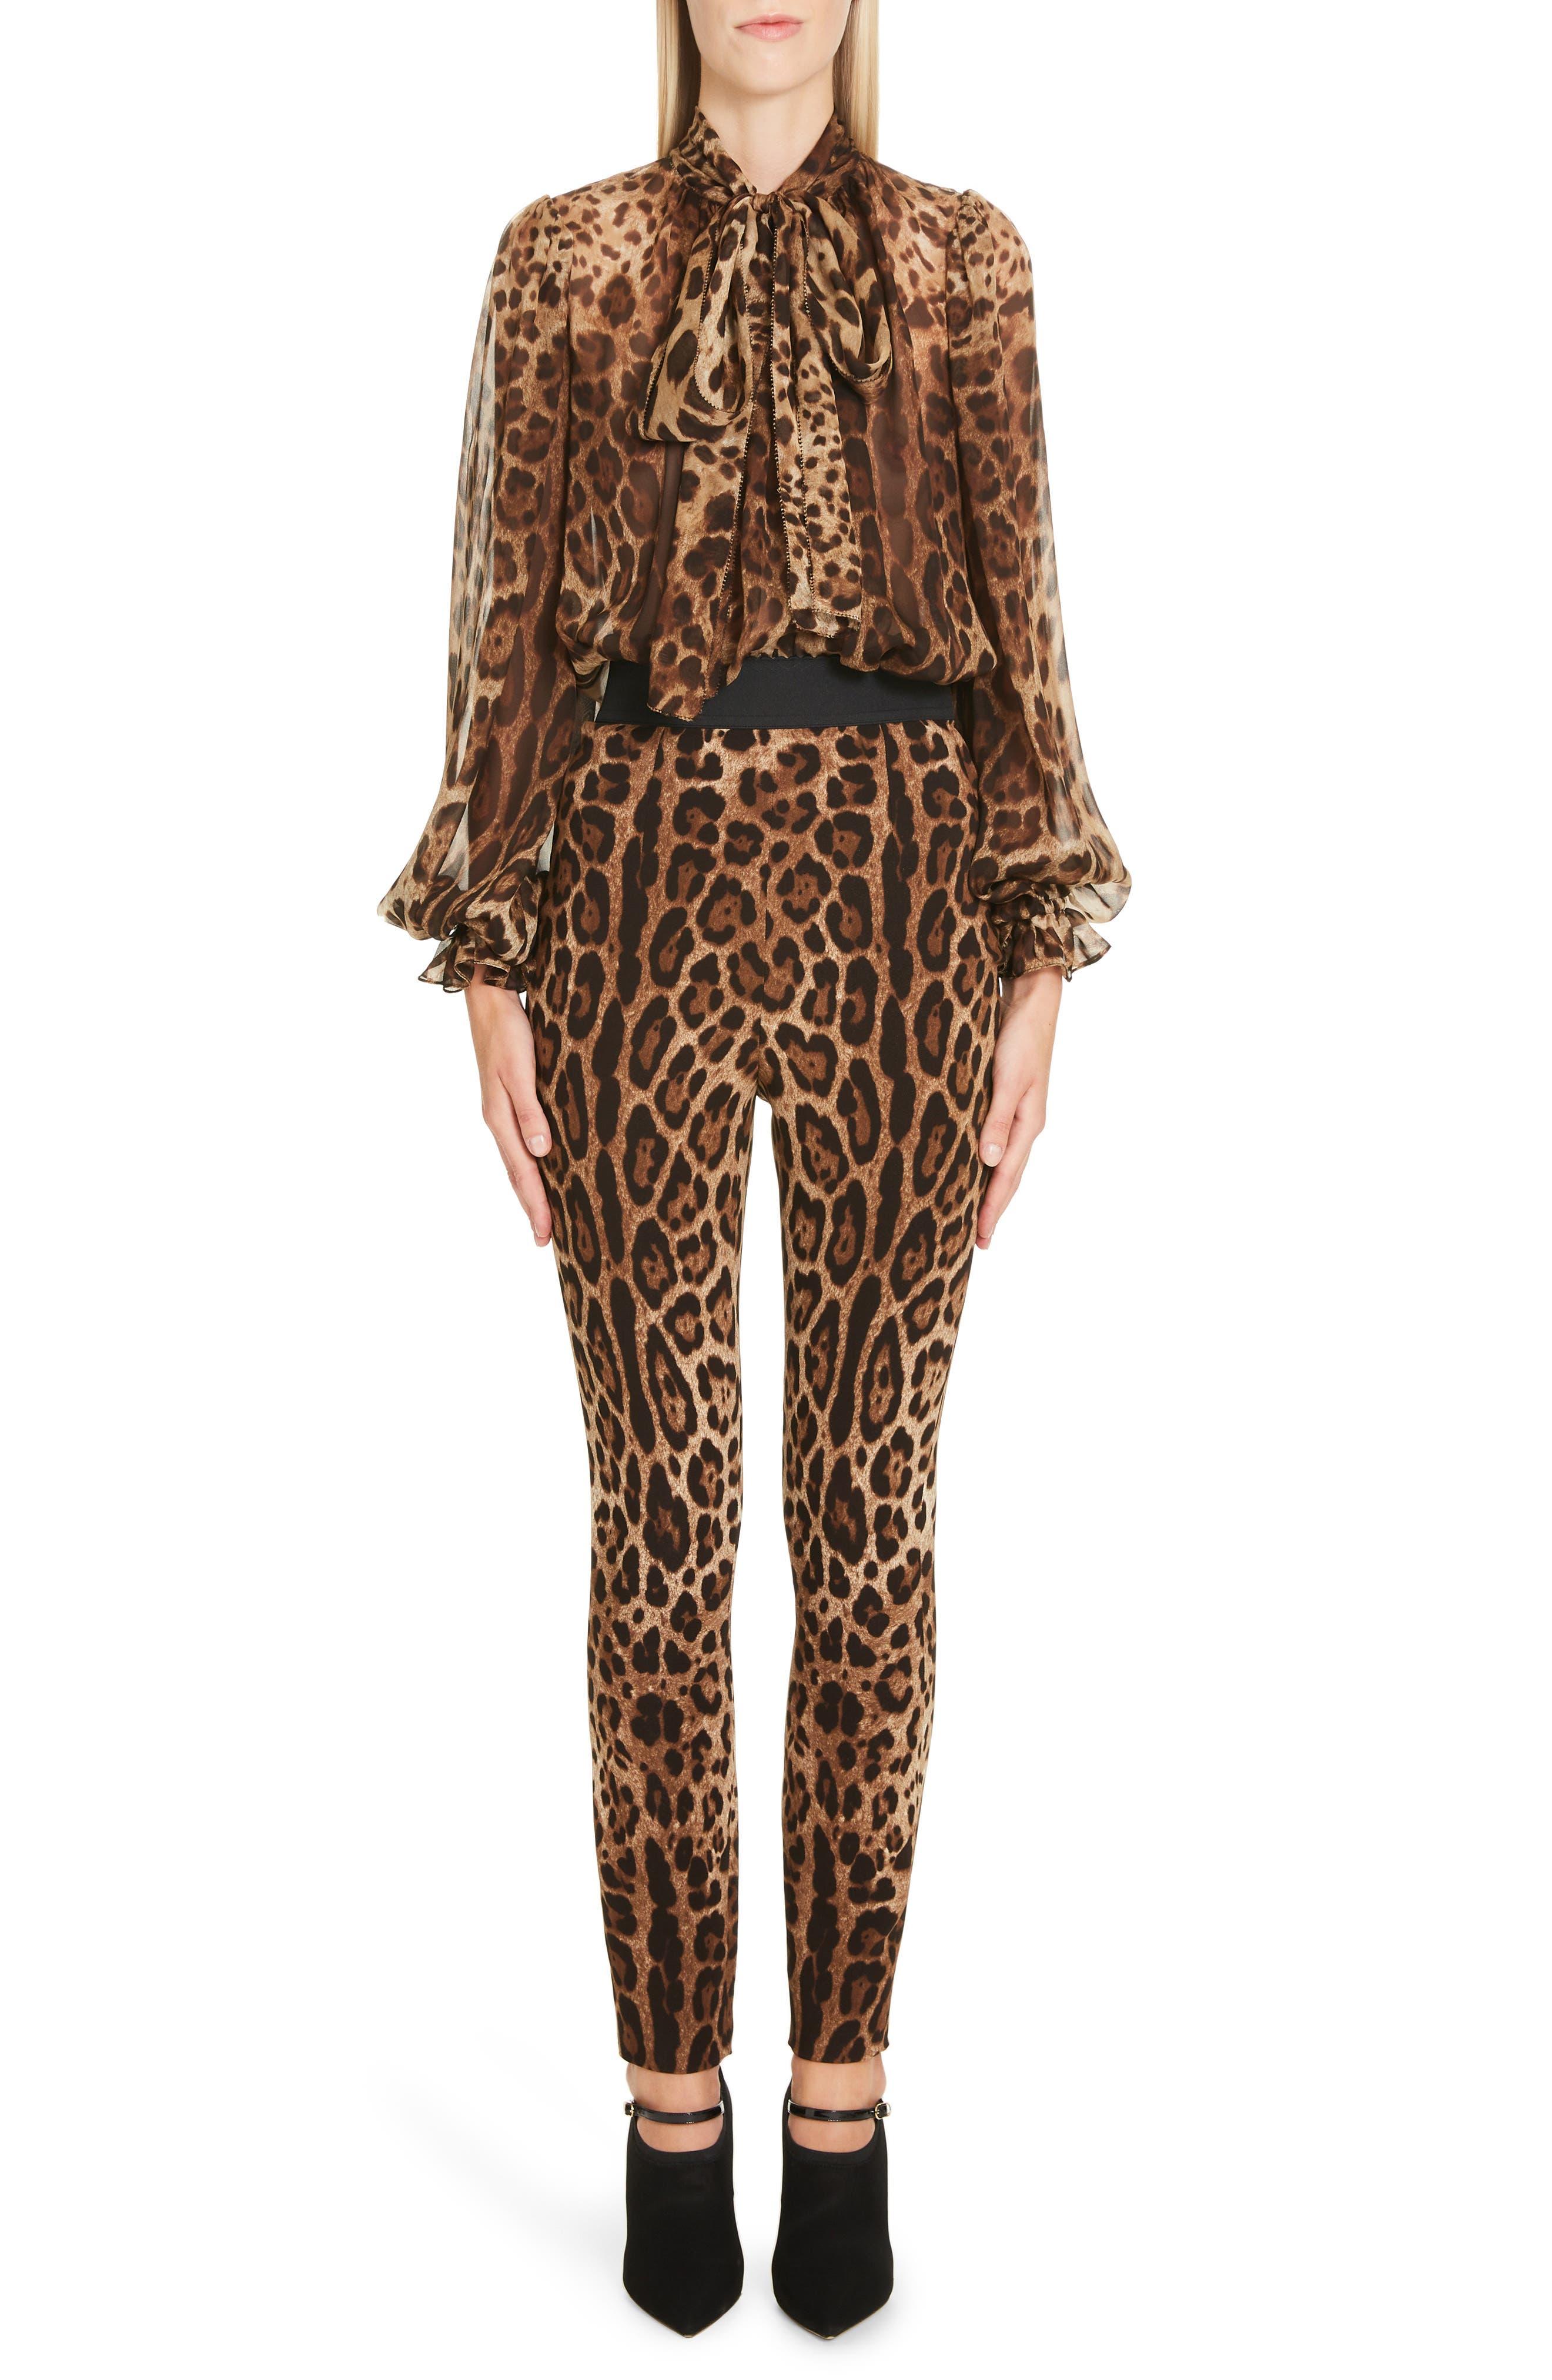 DOLCE&GABBANA, Leopard Print Cady Leggings, Alternate thumbnail 7, color, LEO